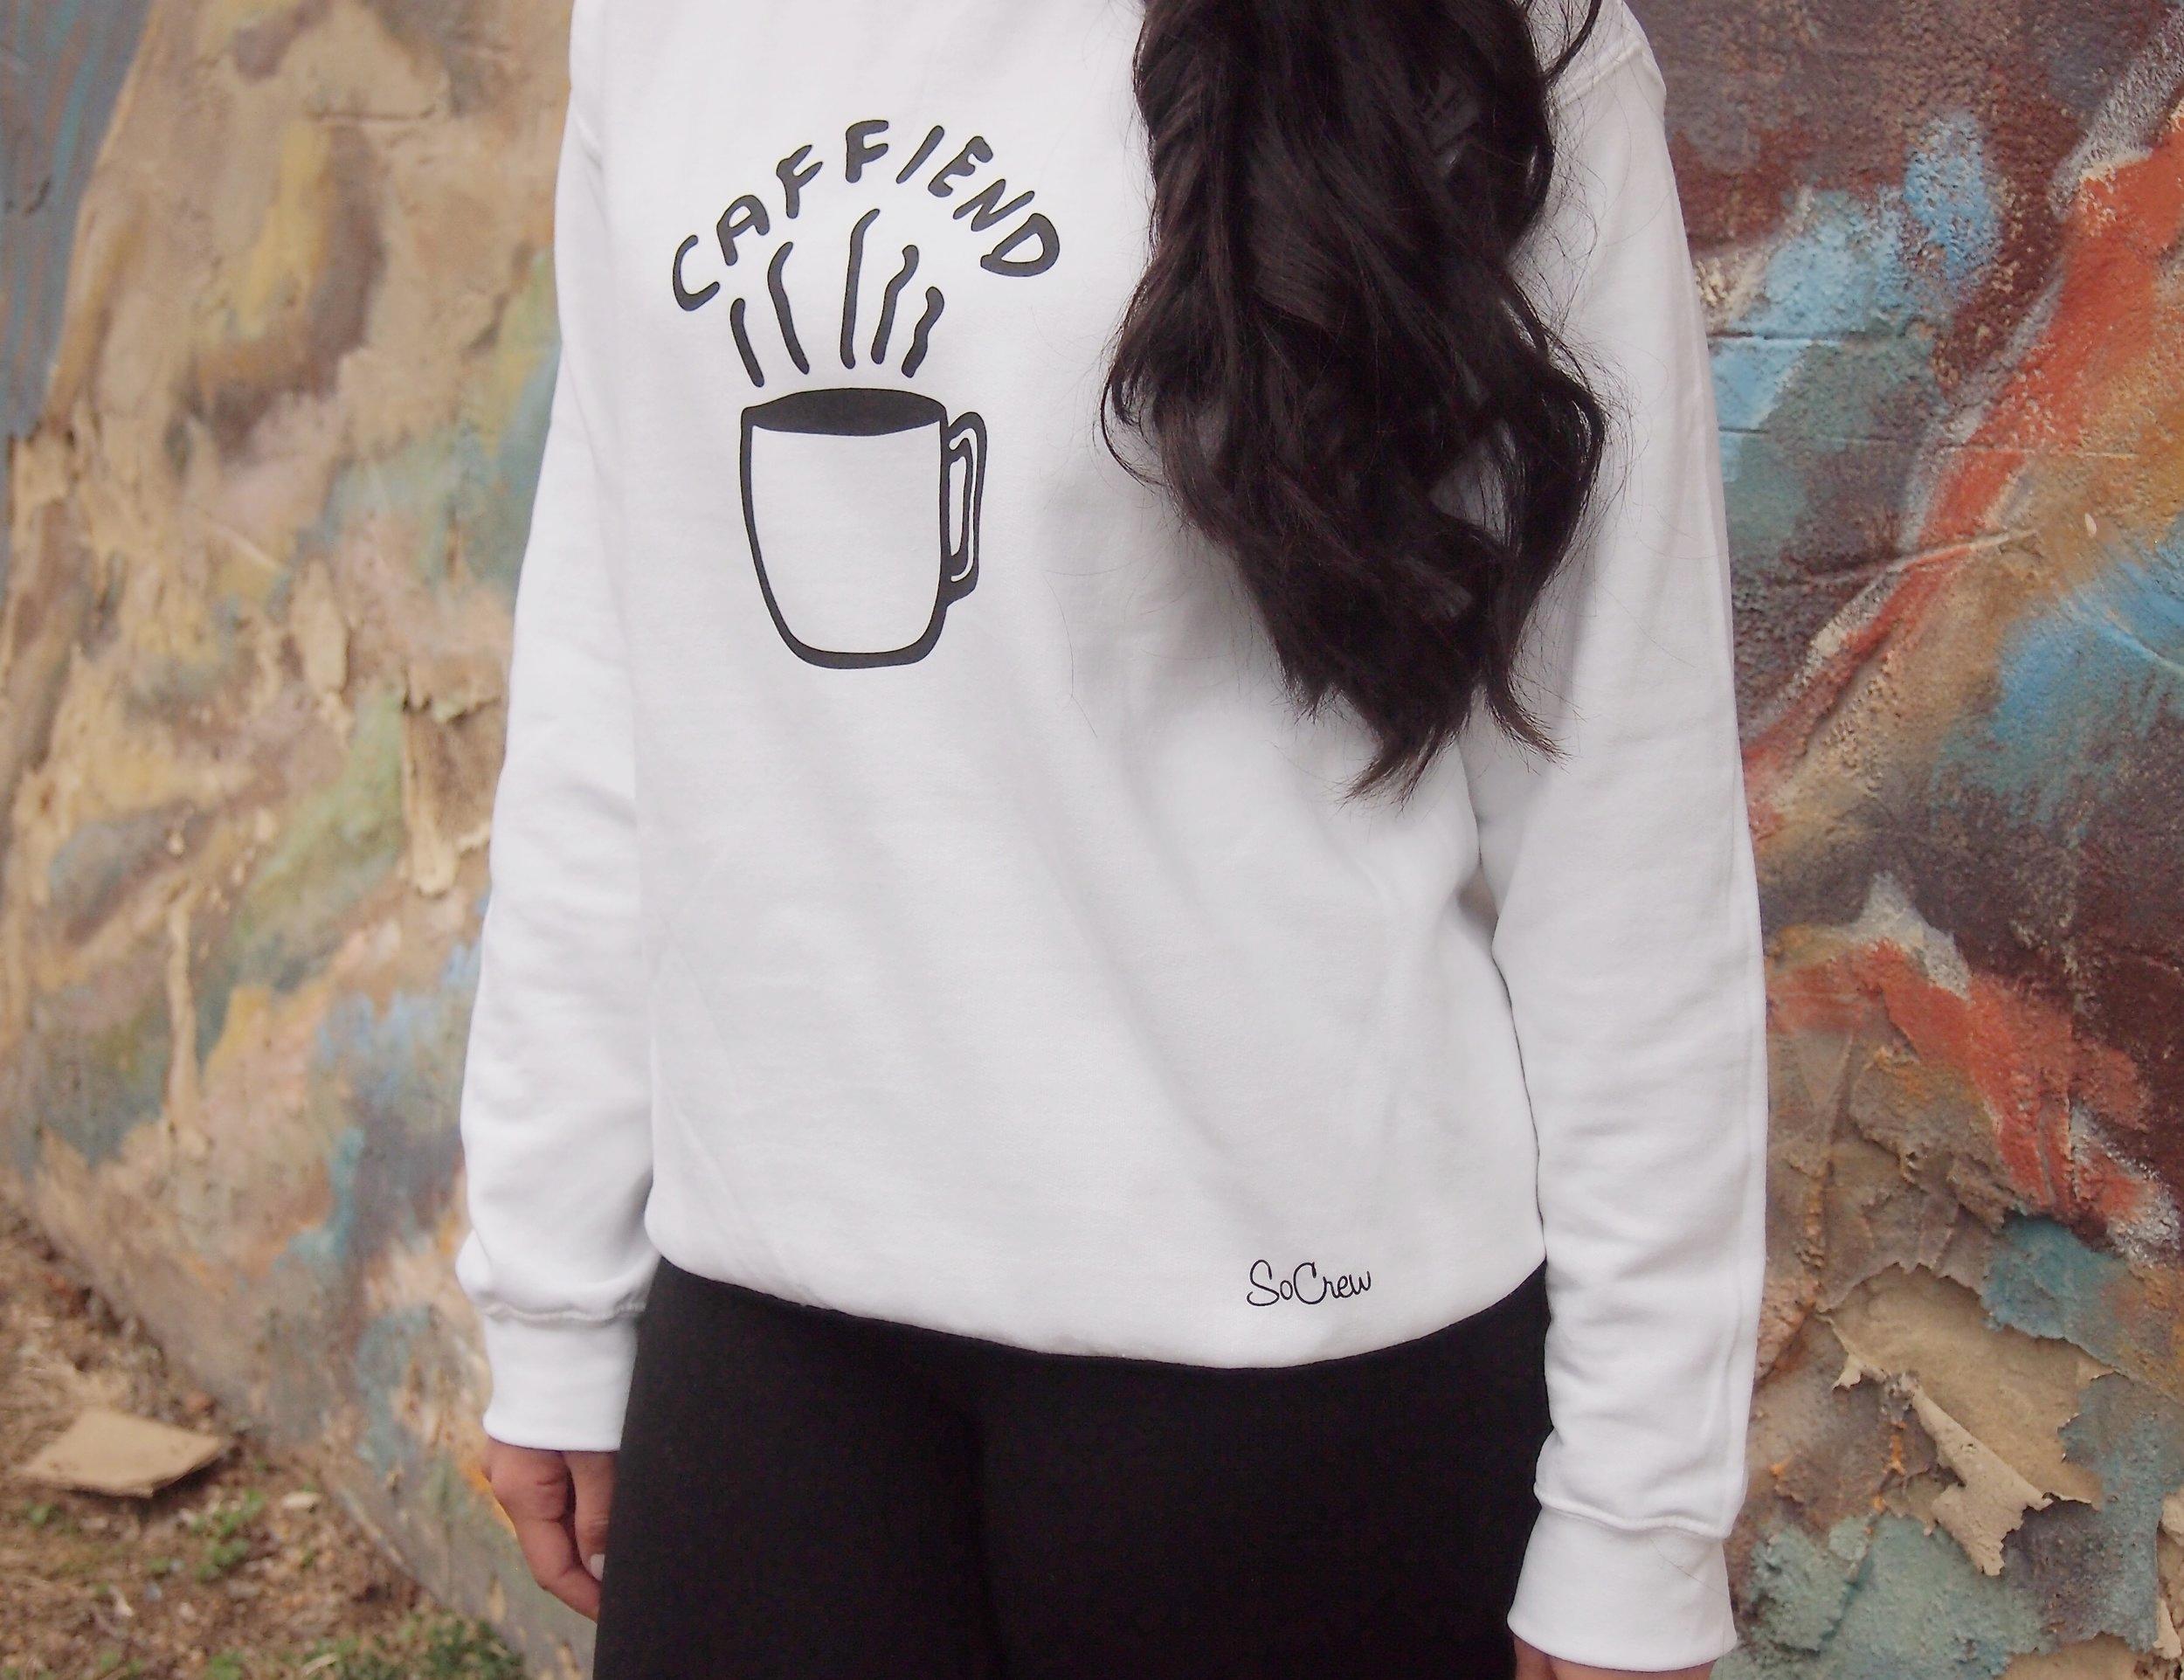 socialcrewclothing-handmade-crewneck-sweatshirt.jpg